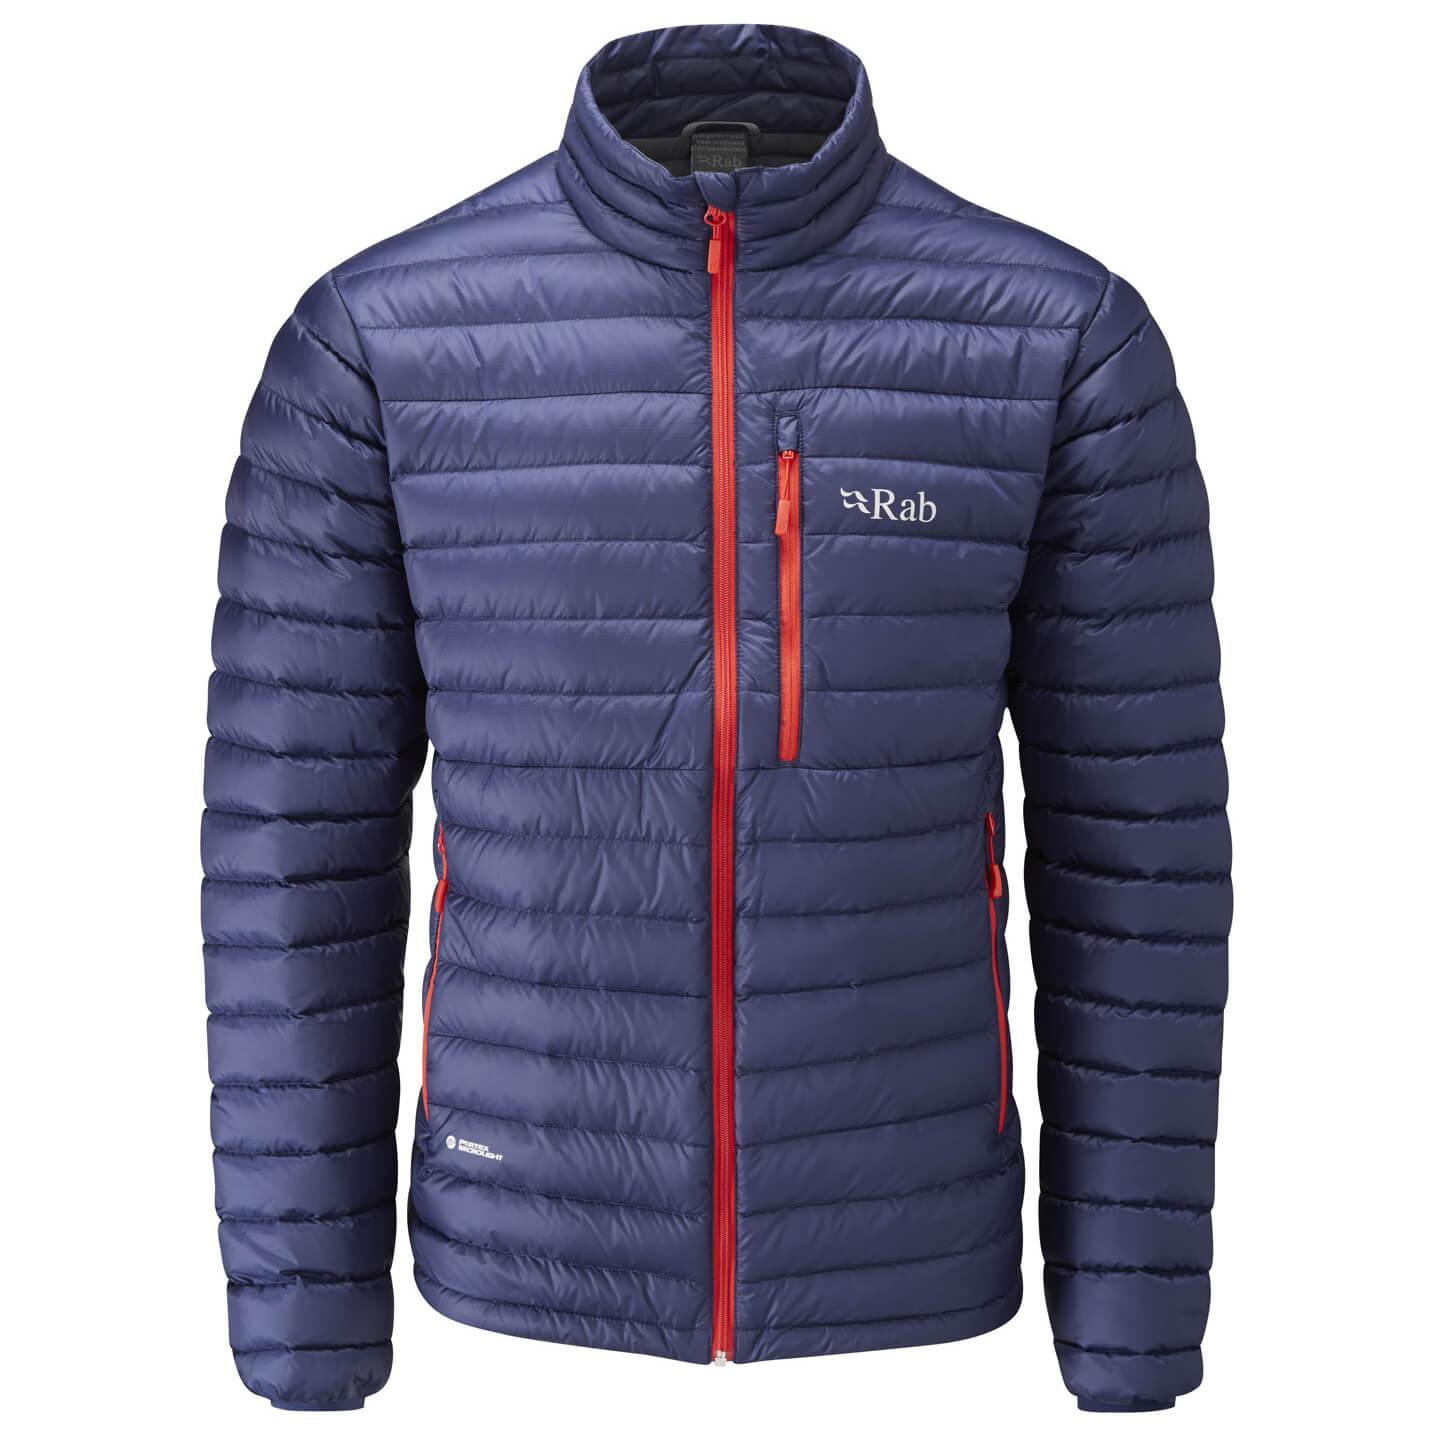 Buy rab jacket